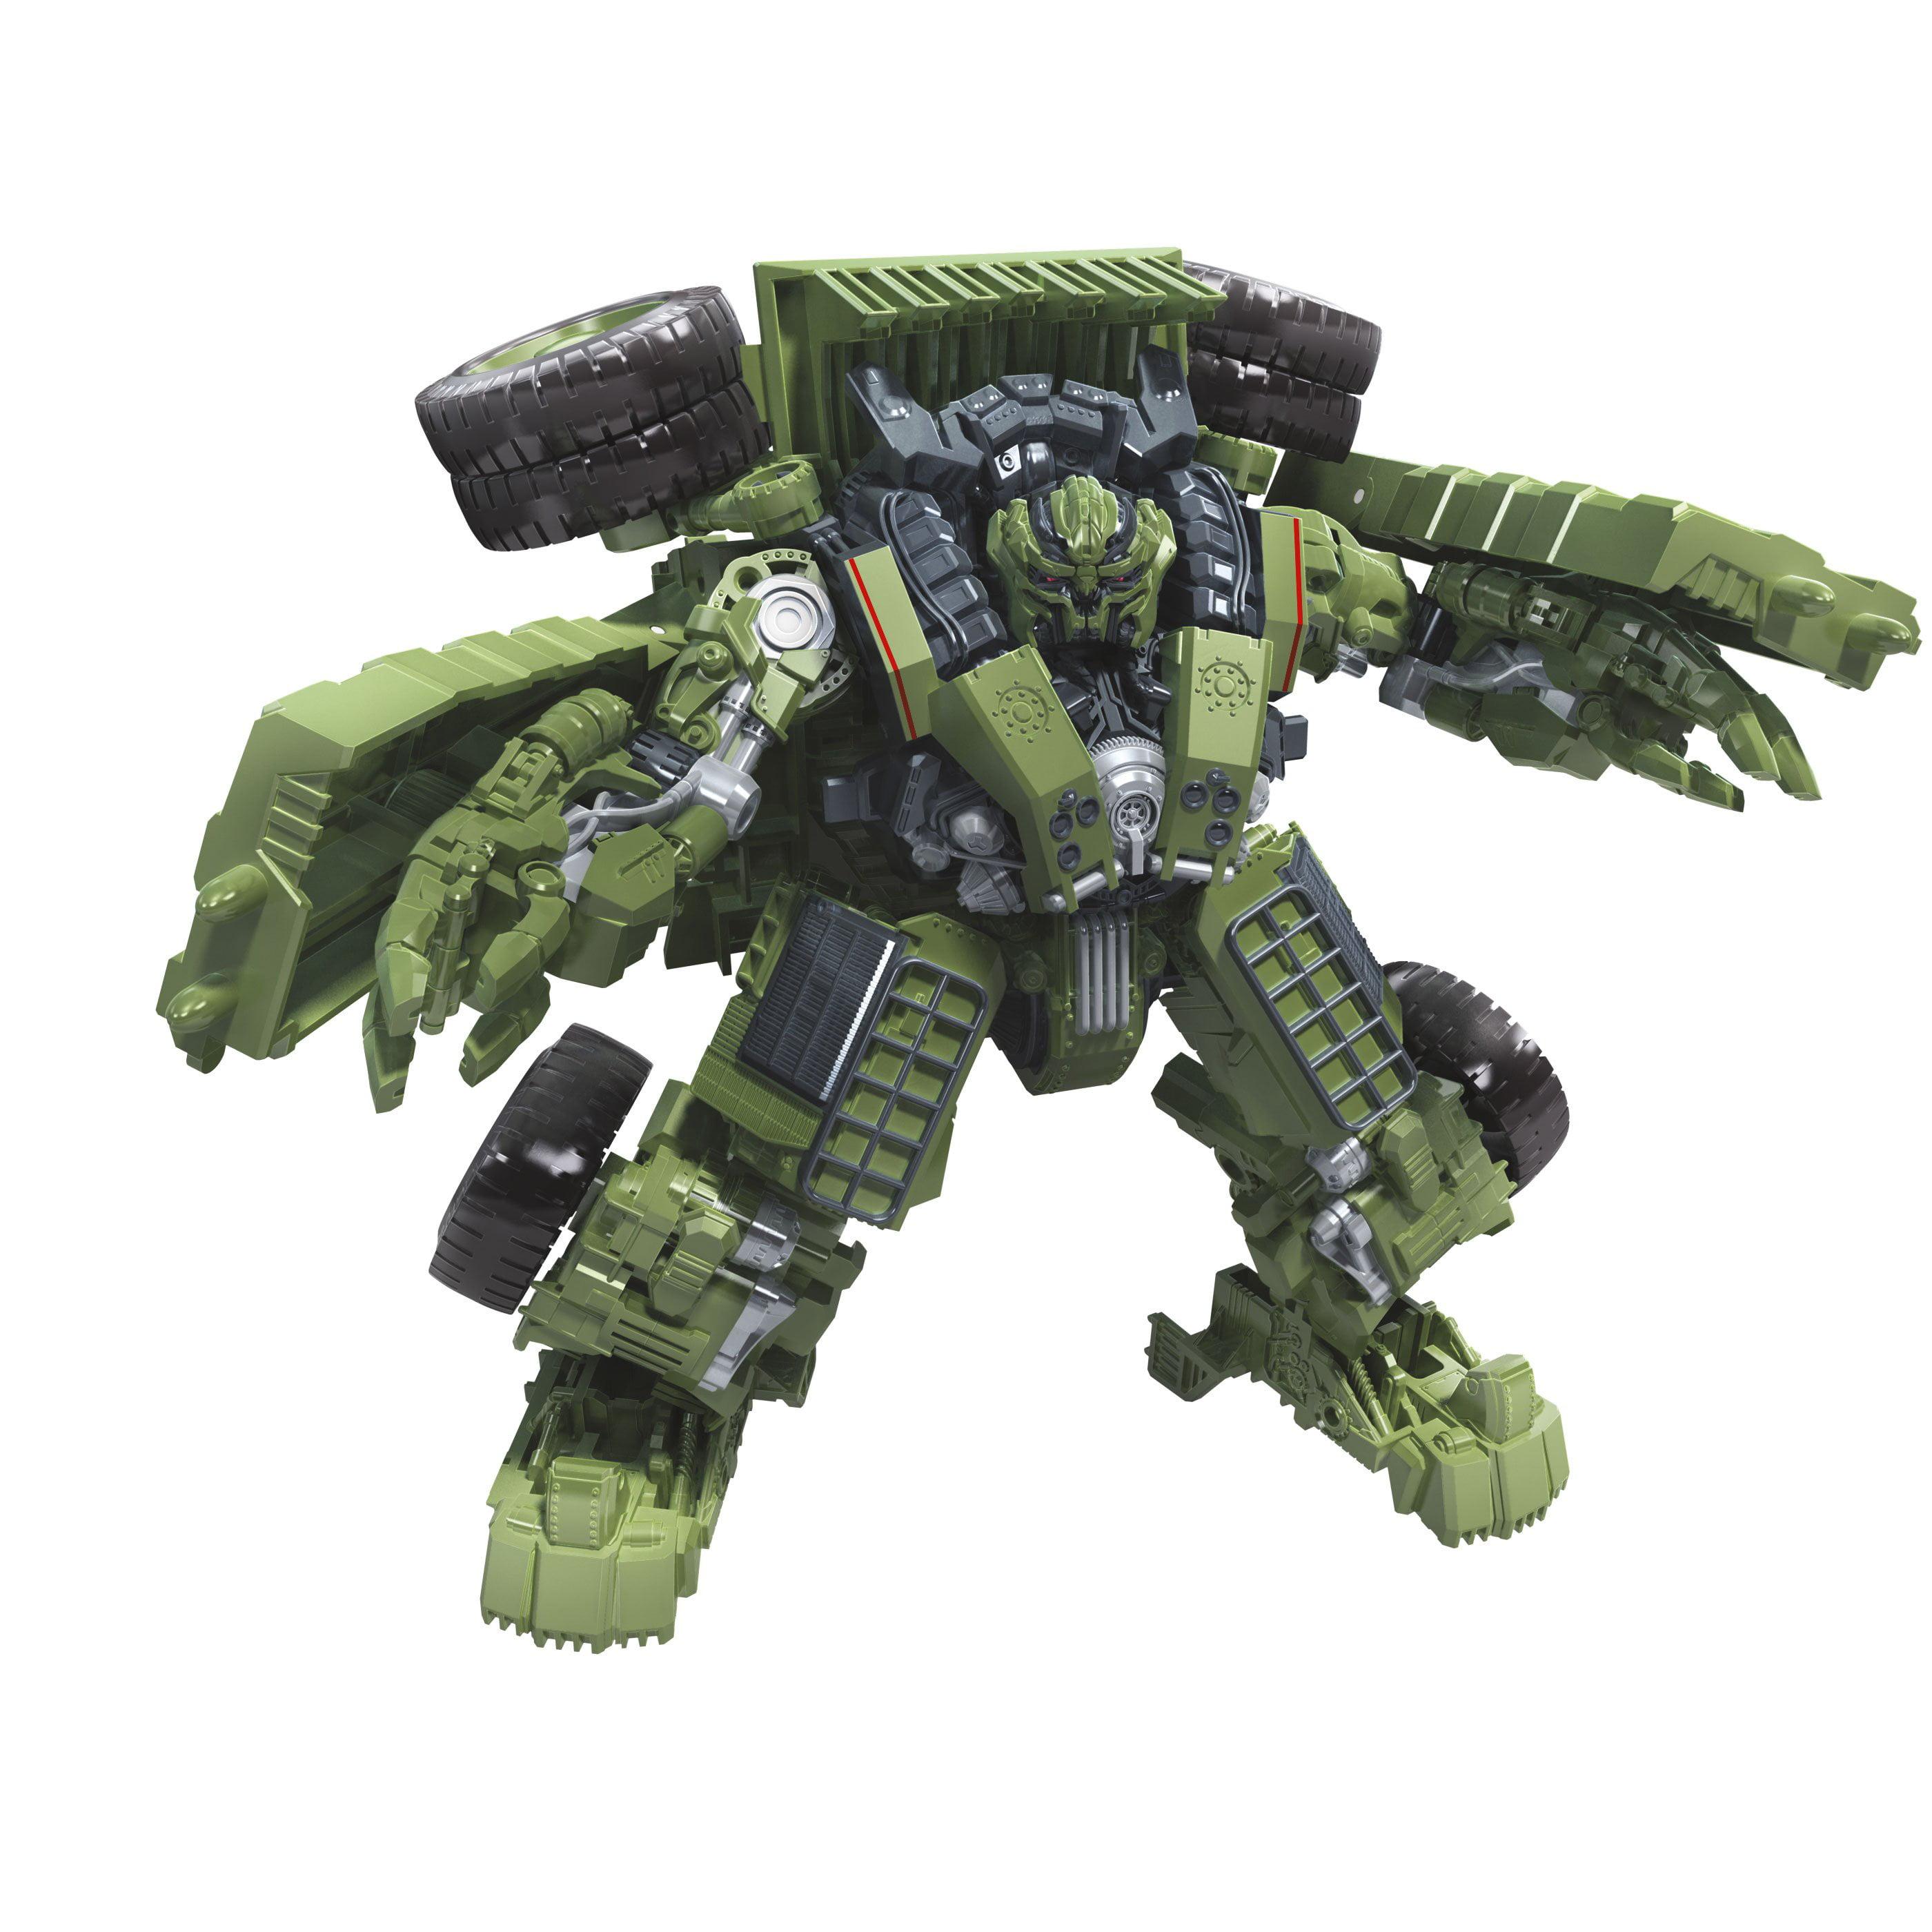 Transformers LONG HAUL Studio Series 42 Takara Tomy Hasbro Voyager Action Figure